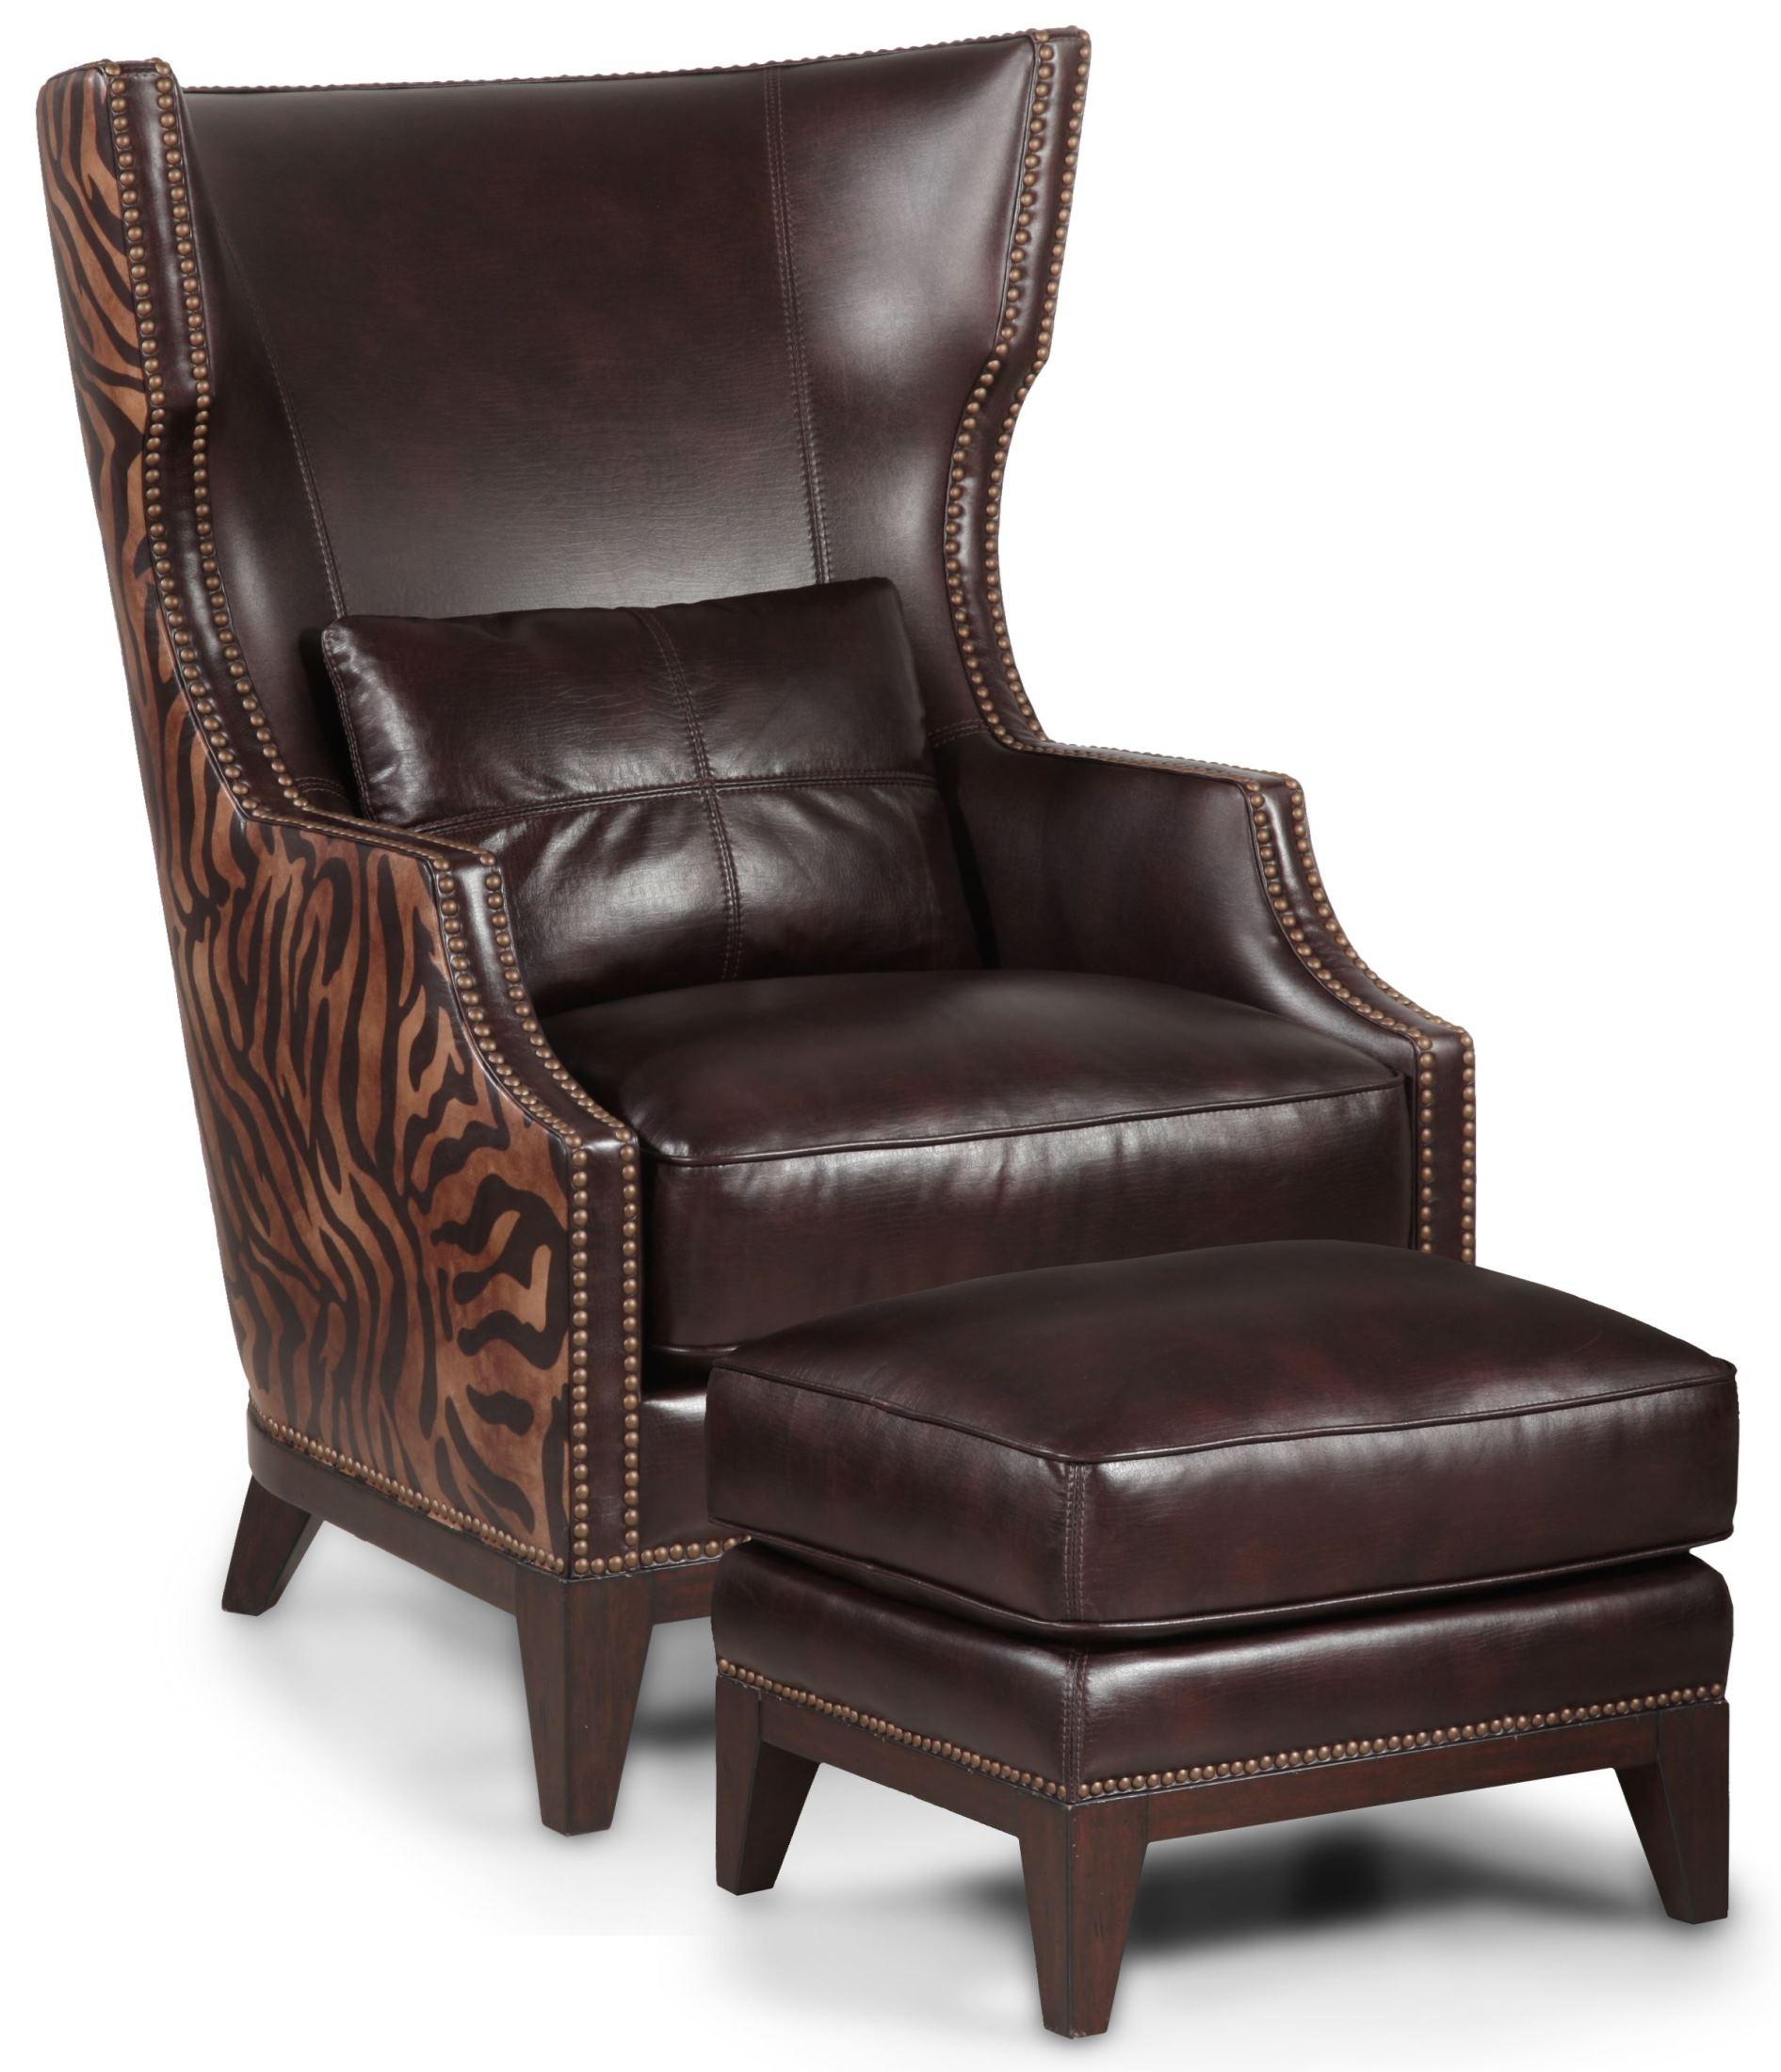 zebra print office chair dimensions cm forbes black accent & ottoman from simon li (h056-2a-n7-e164) | coleman furniture